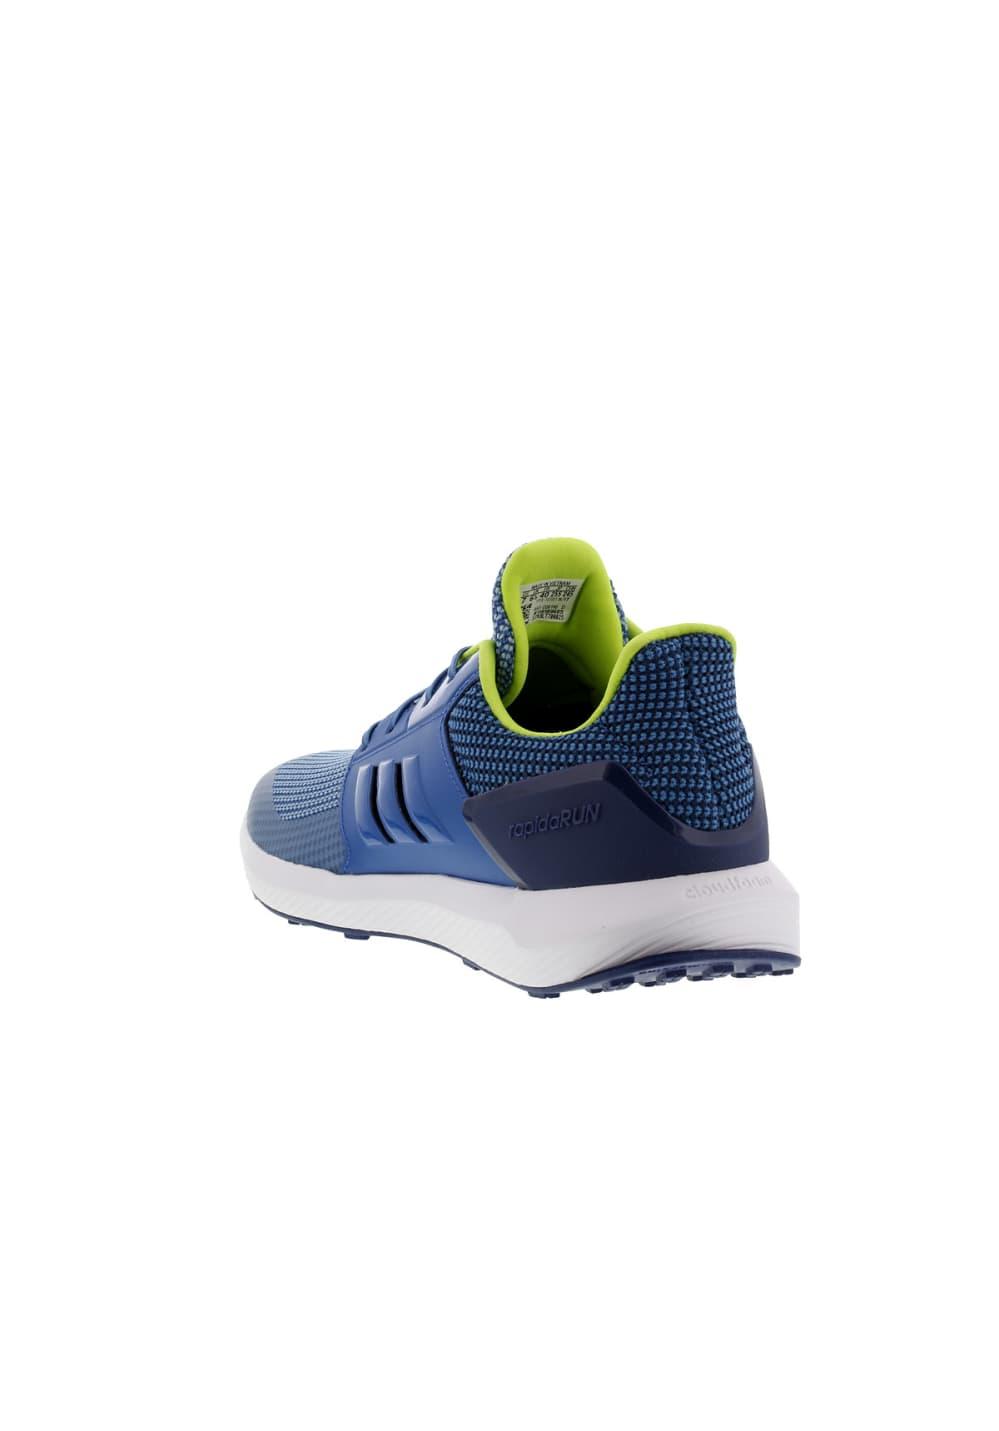 new product 4110c 1d1b0 adidas Rapidarun K - Running shoes - Blue  21RUN